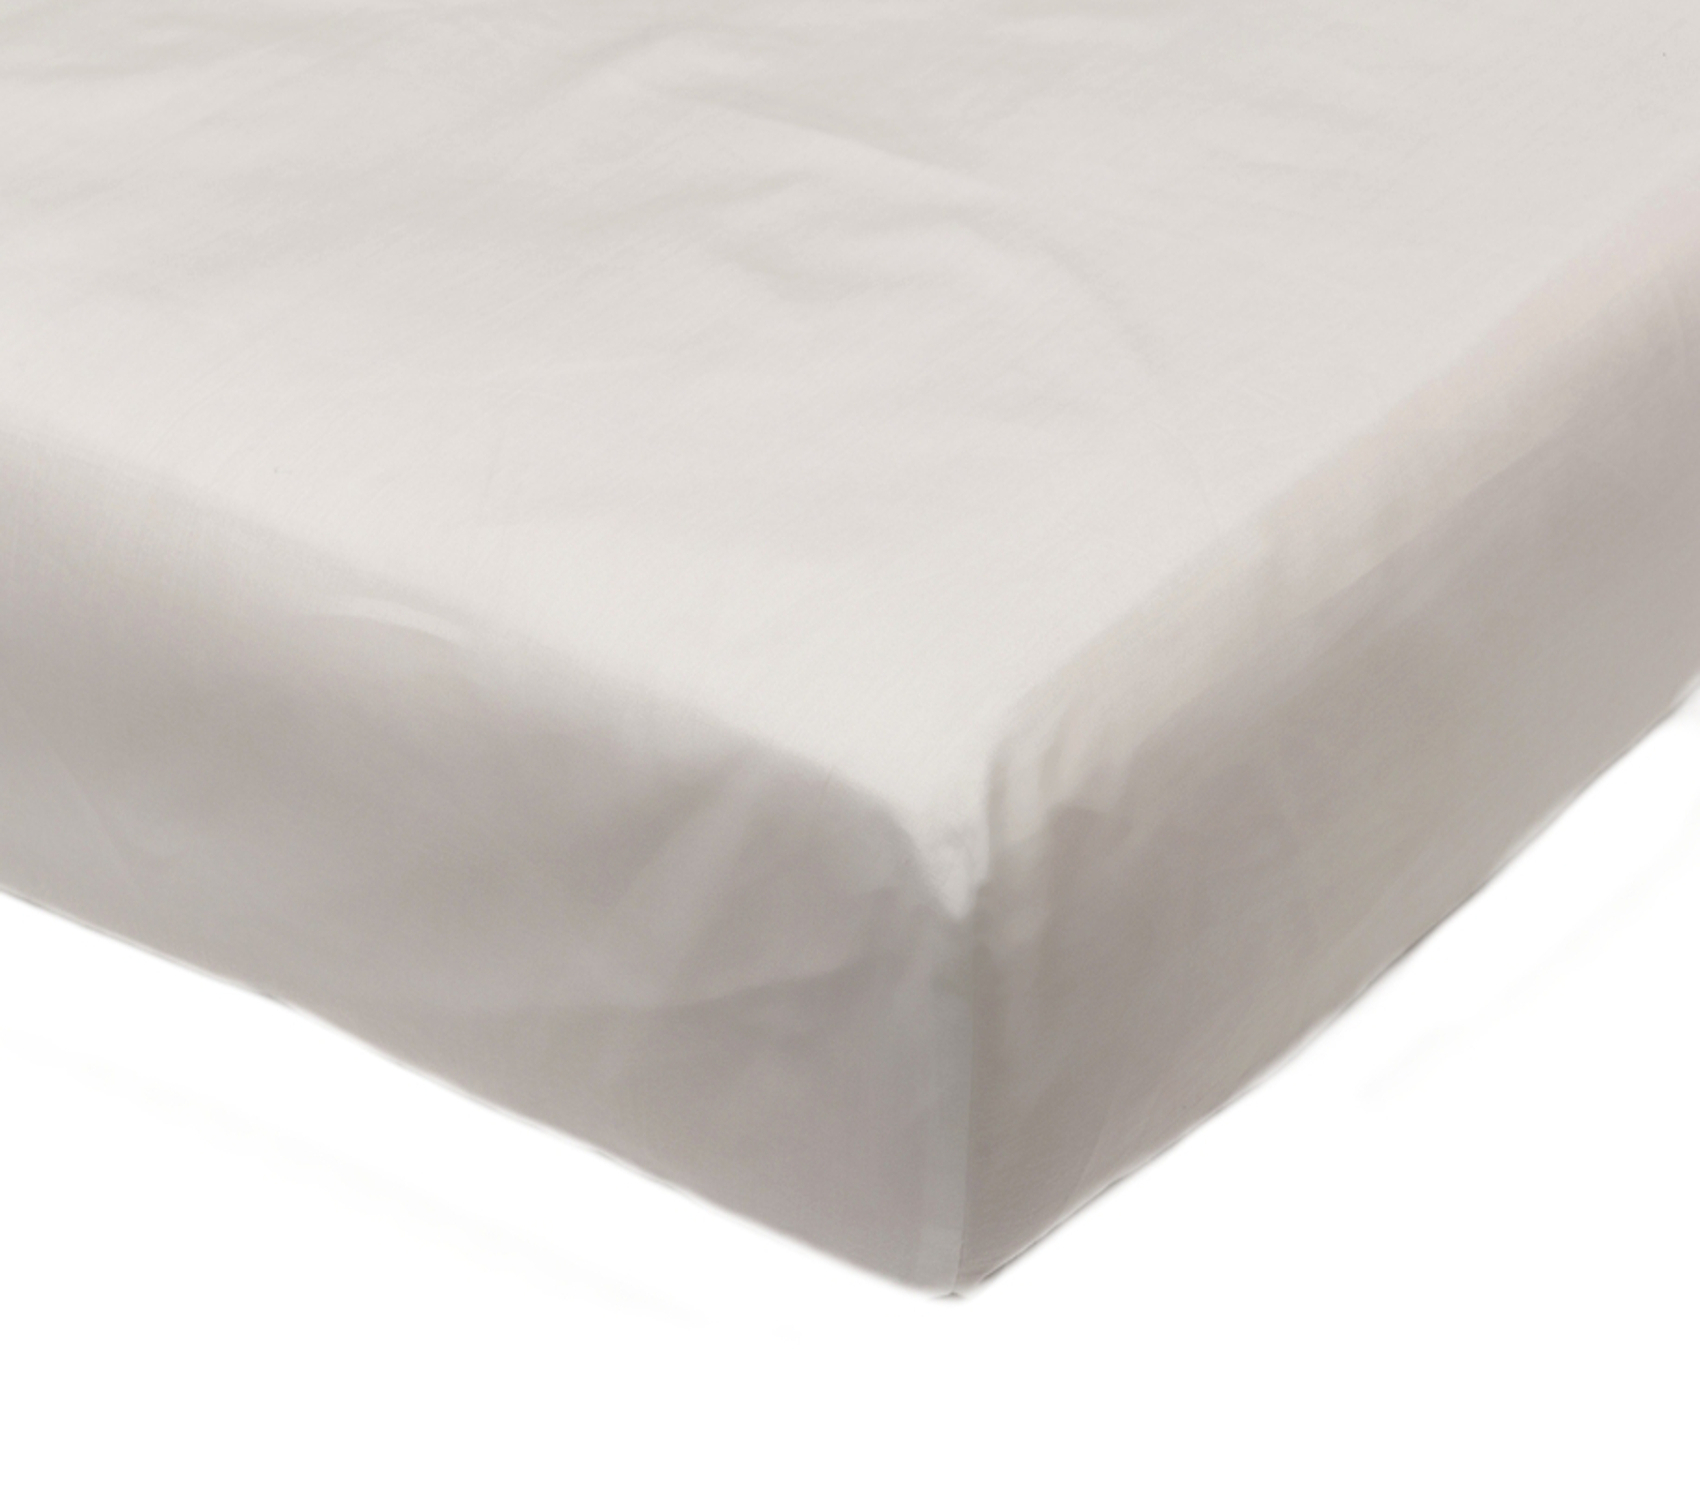 Extra Deep Ed Sheet Easy Iron Combed Cotton